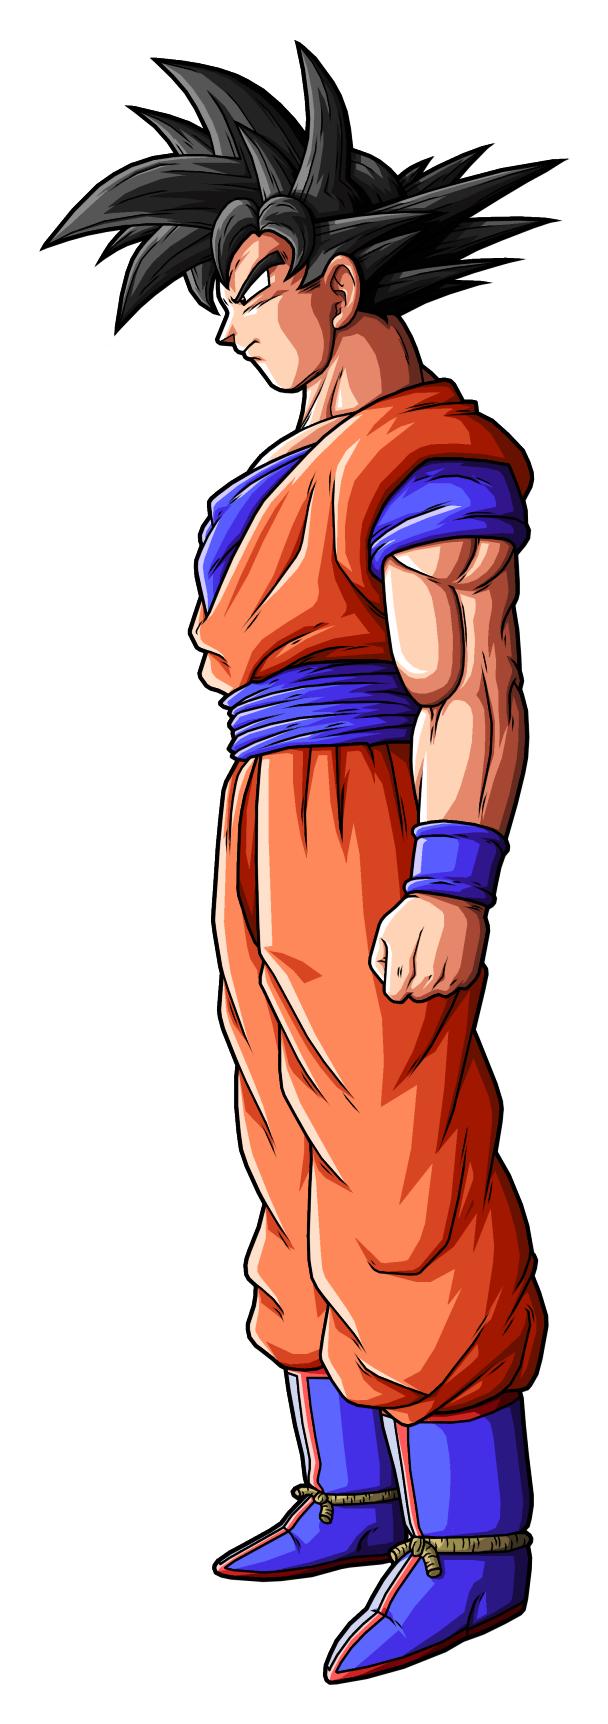 Goku Normal by drozdoo on DeviantArt